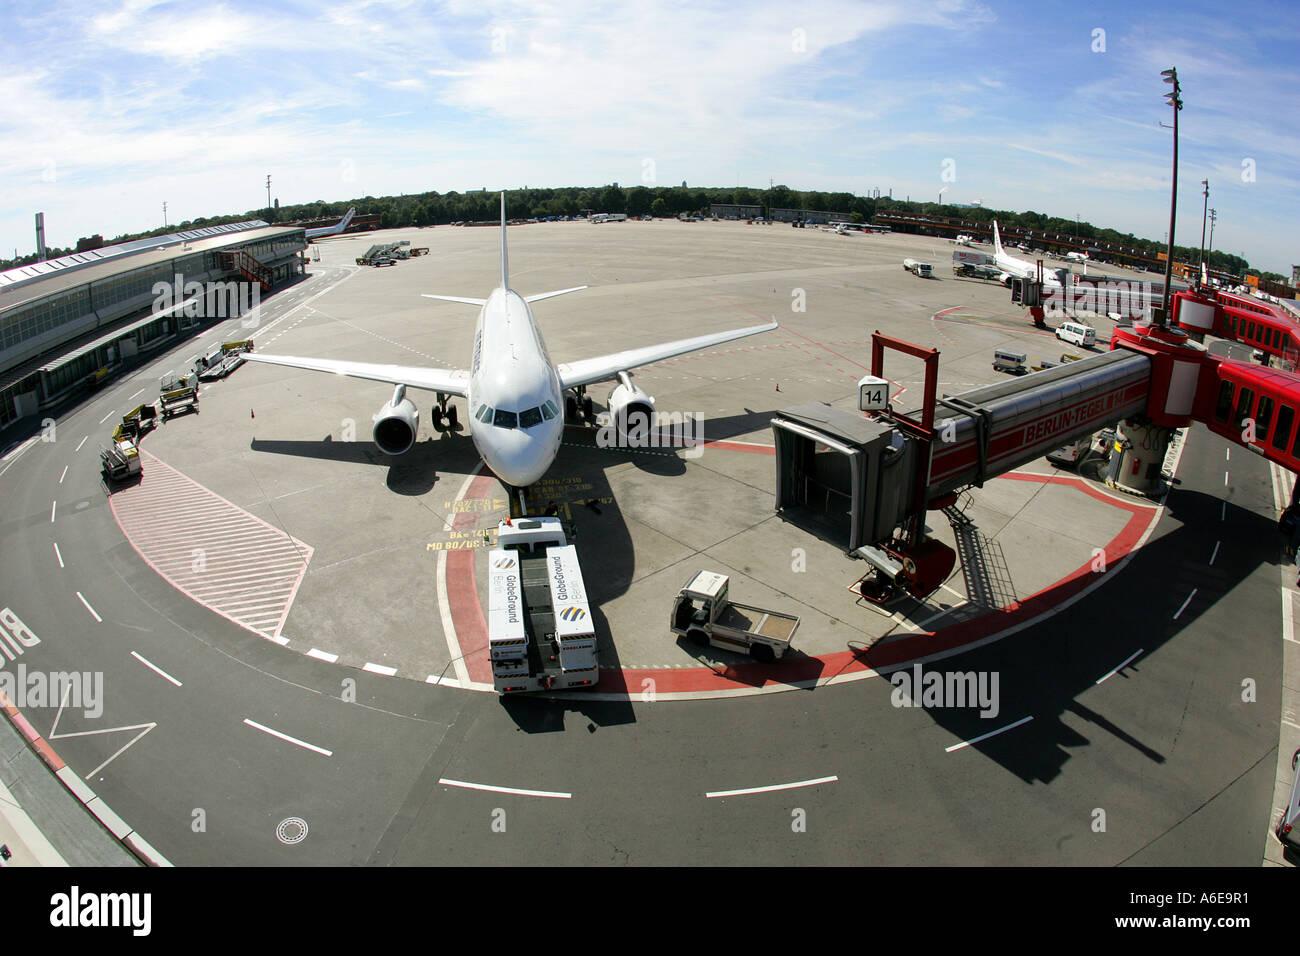 Airplane and boarding bridges at Tegel airport, Berlin - Stock Image